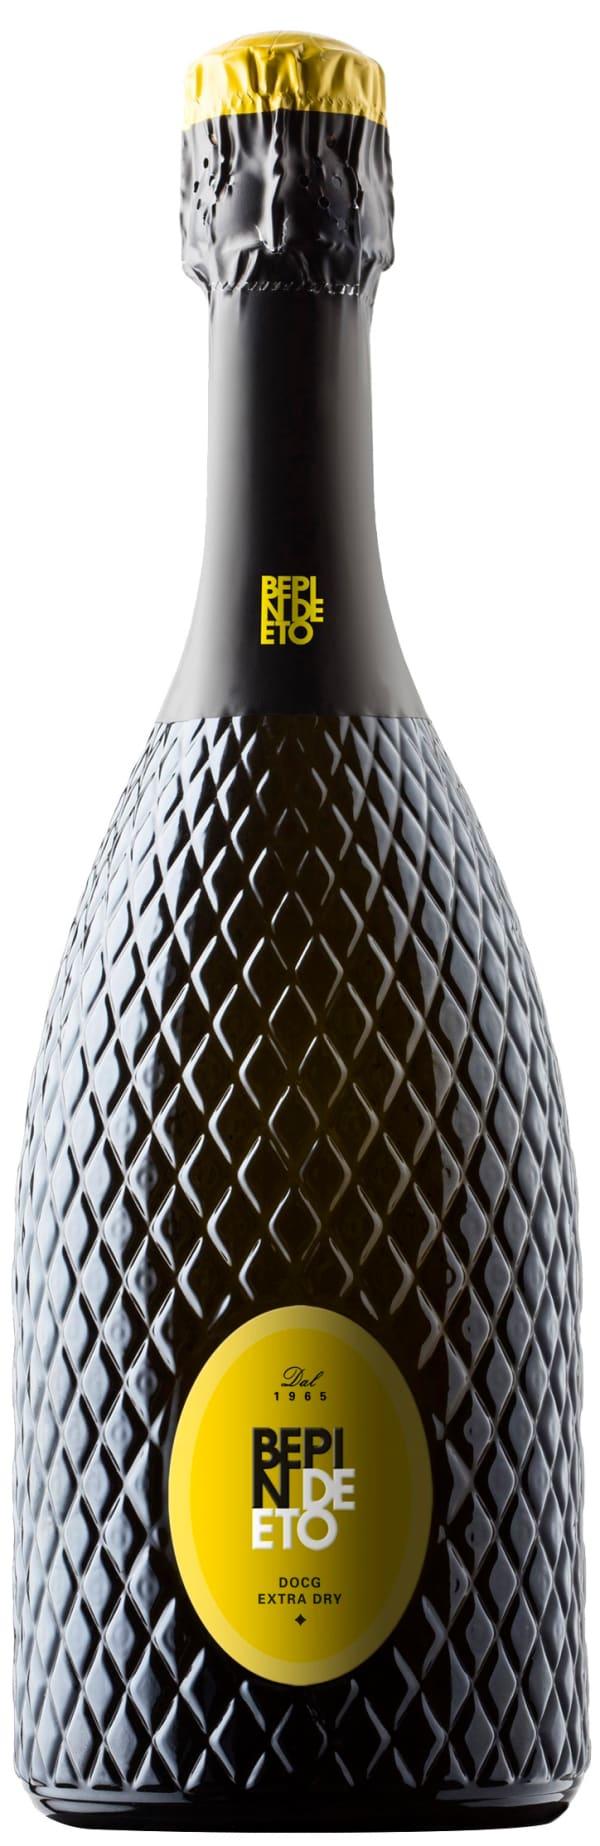 Bepin de Eto Prosecco Extra Dry 2018